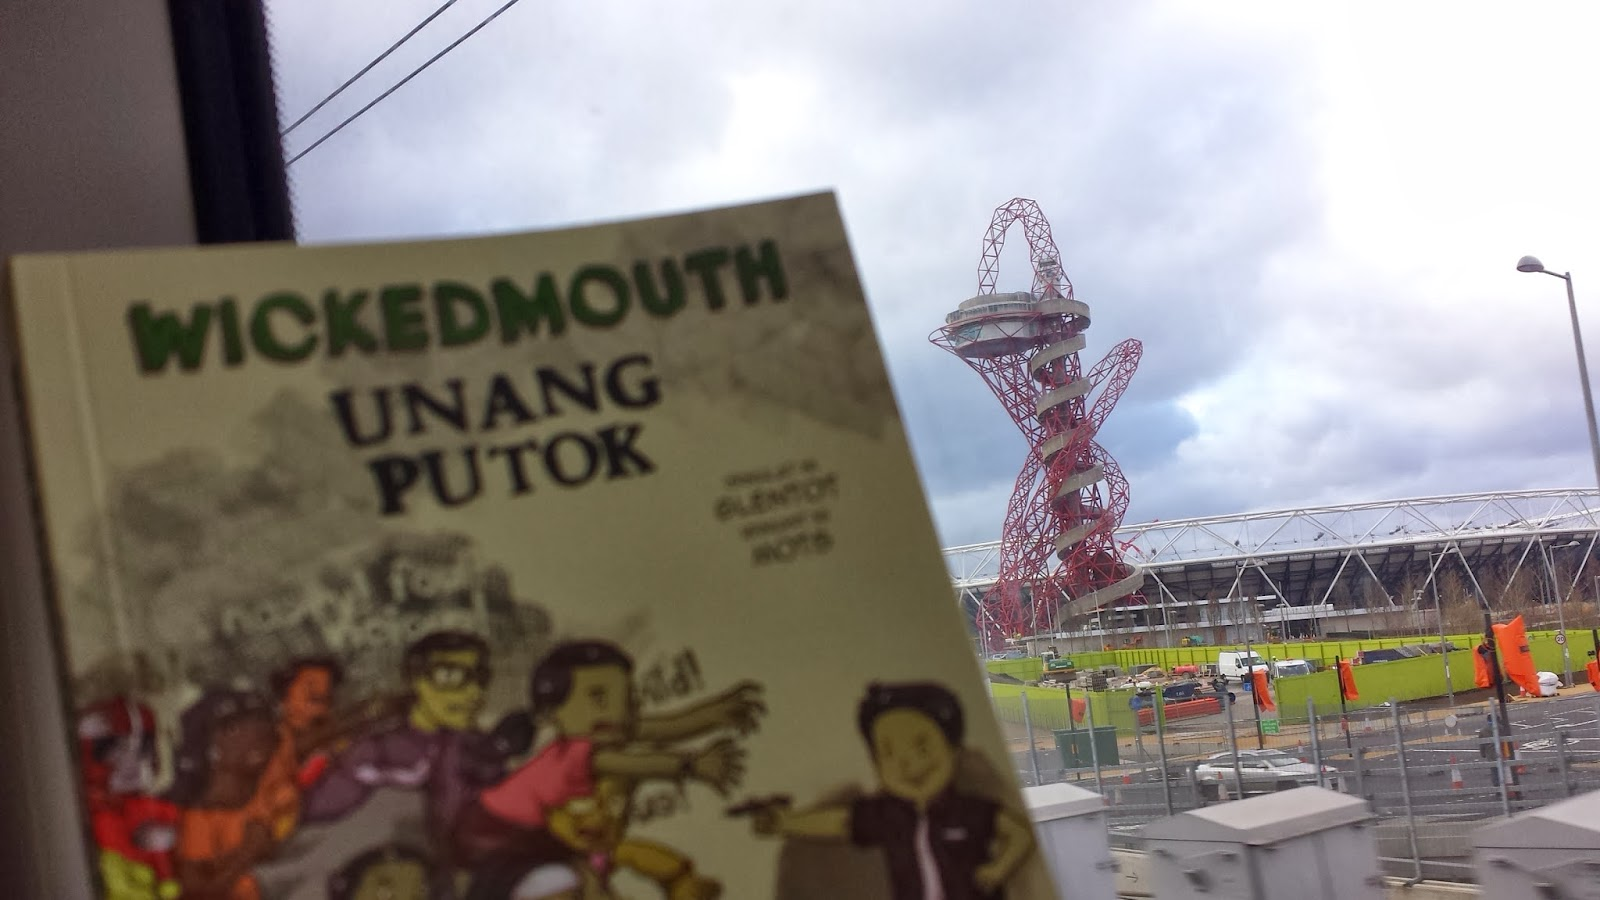 Book Review: Unang Putok invades London